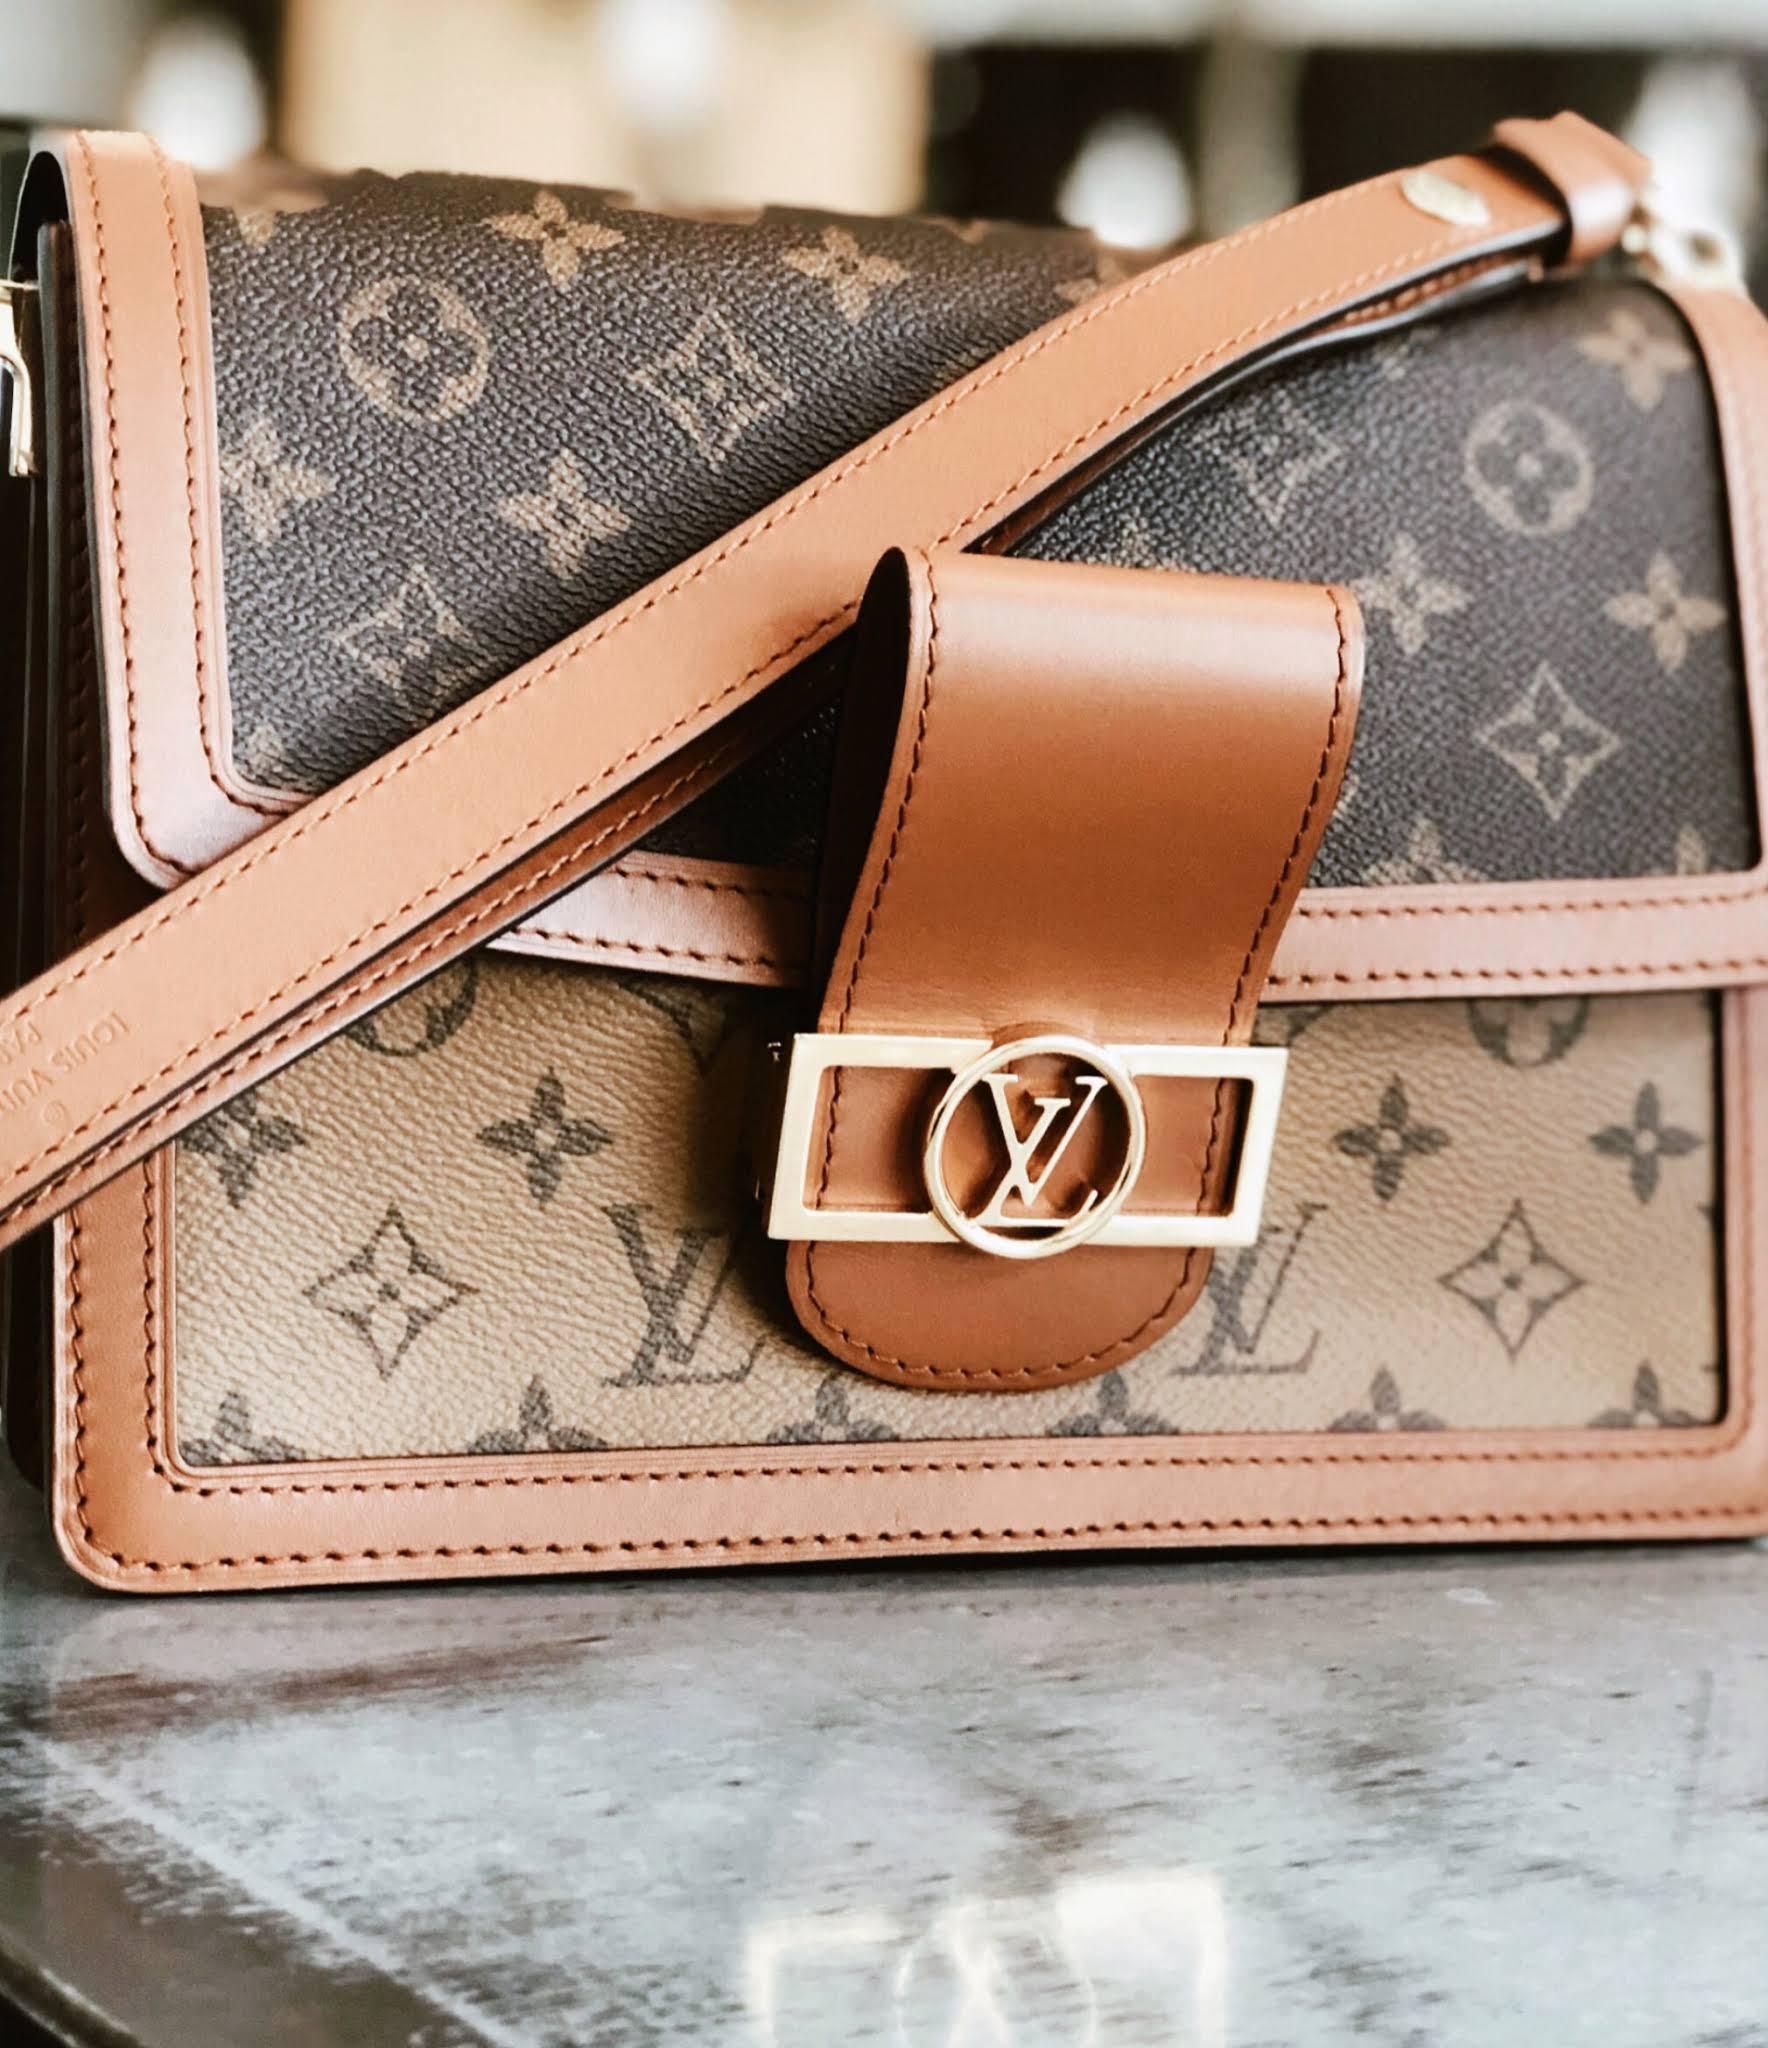 Louis Vuitton Dauphine MM handbag reverse print